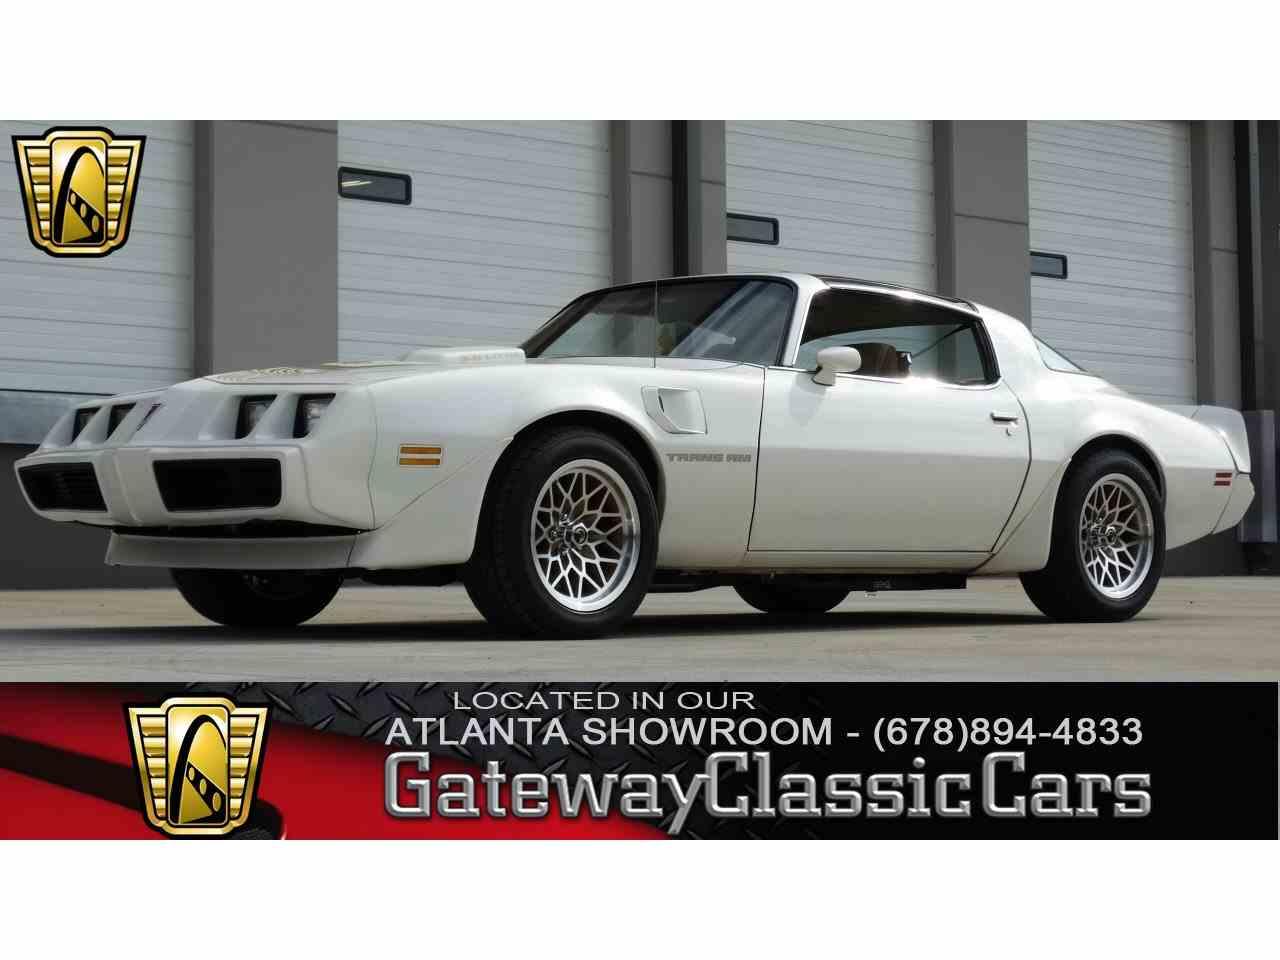 Large Picture of '81 Pontiac Firebird located in Alpharetta Georgia - $31,595.00 Offered by Gateway Classic Cars - Atlanta - KGSJ